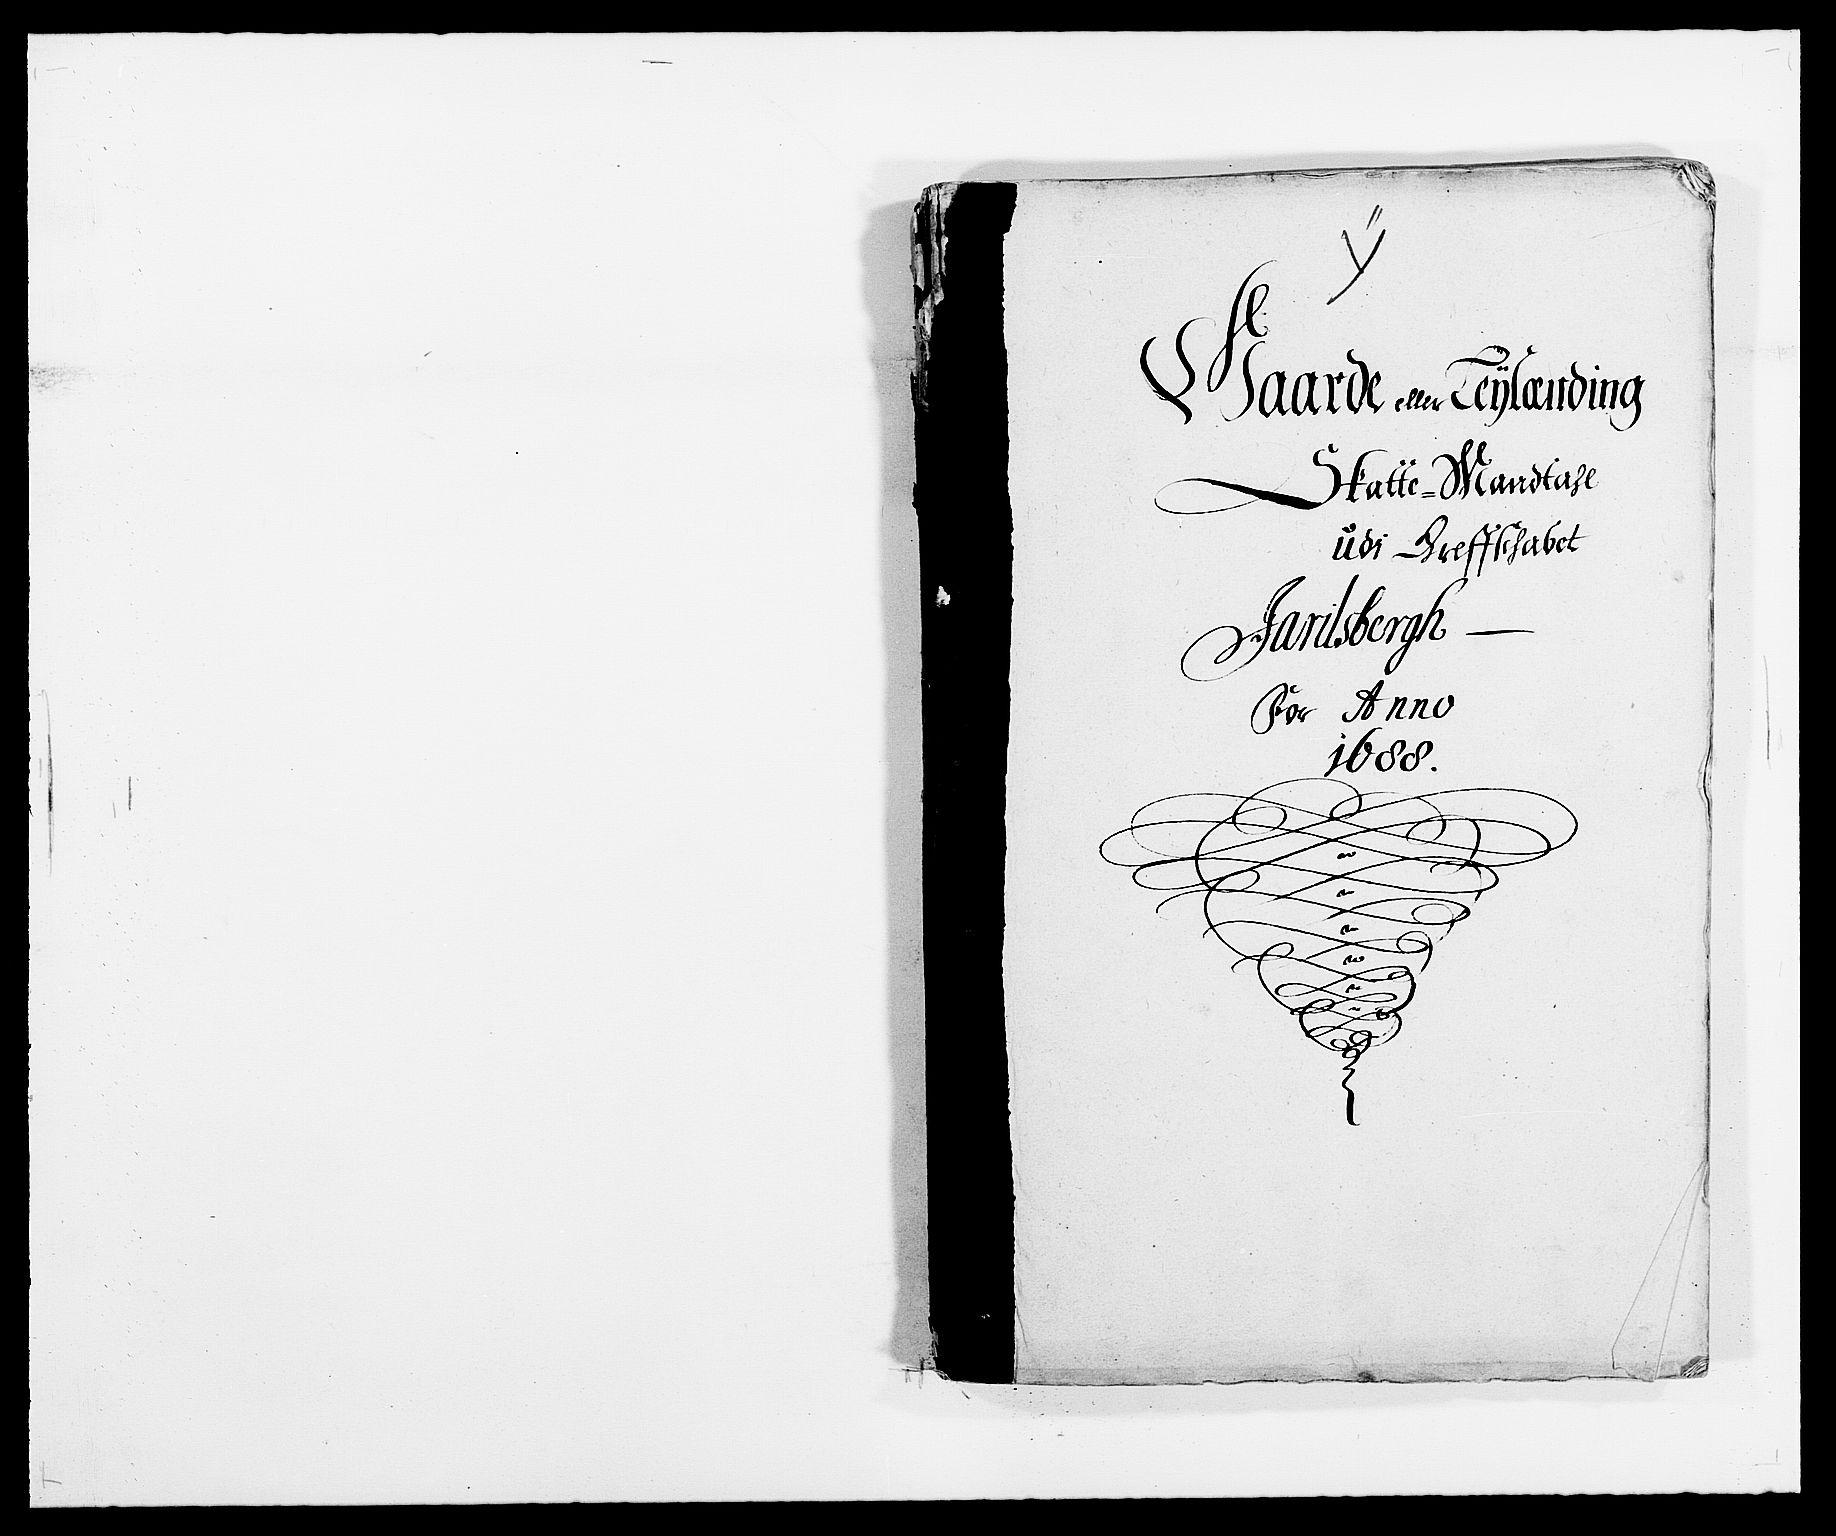 RA, Rentekammeret inntil 1814, Reviderte regnskaper, Fogderegnskap, R32/L1859: Fogderegnskap Jarlsberg grevskap, 1686-1690, s. 1